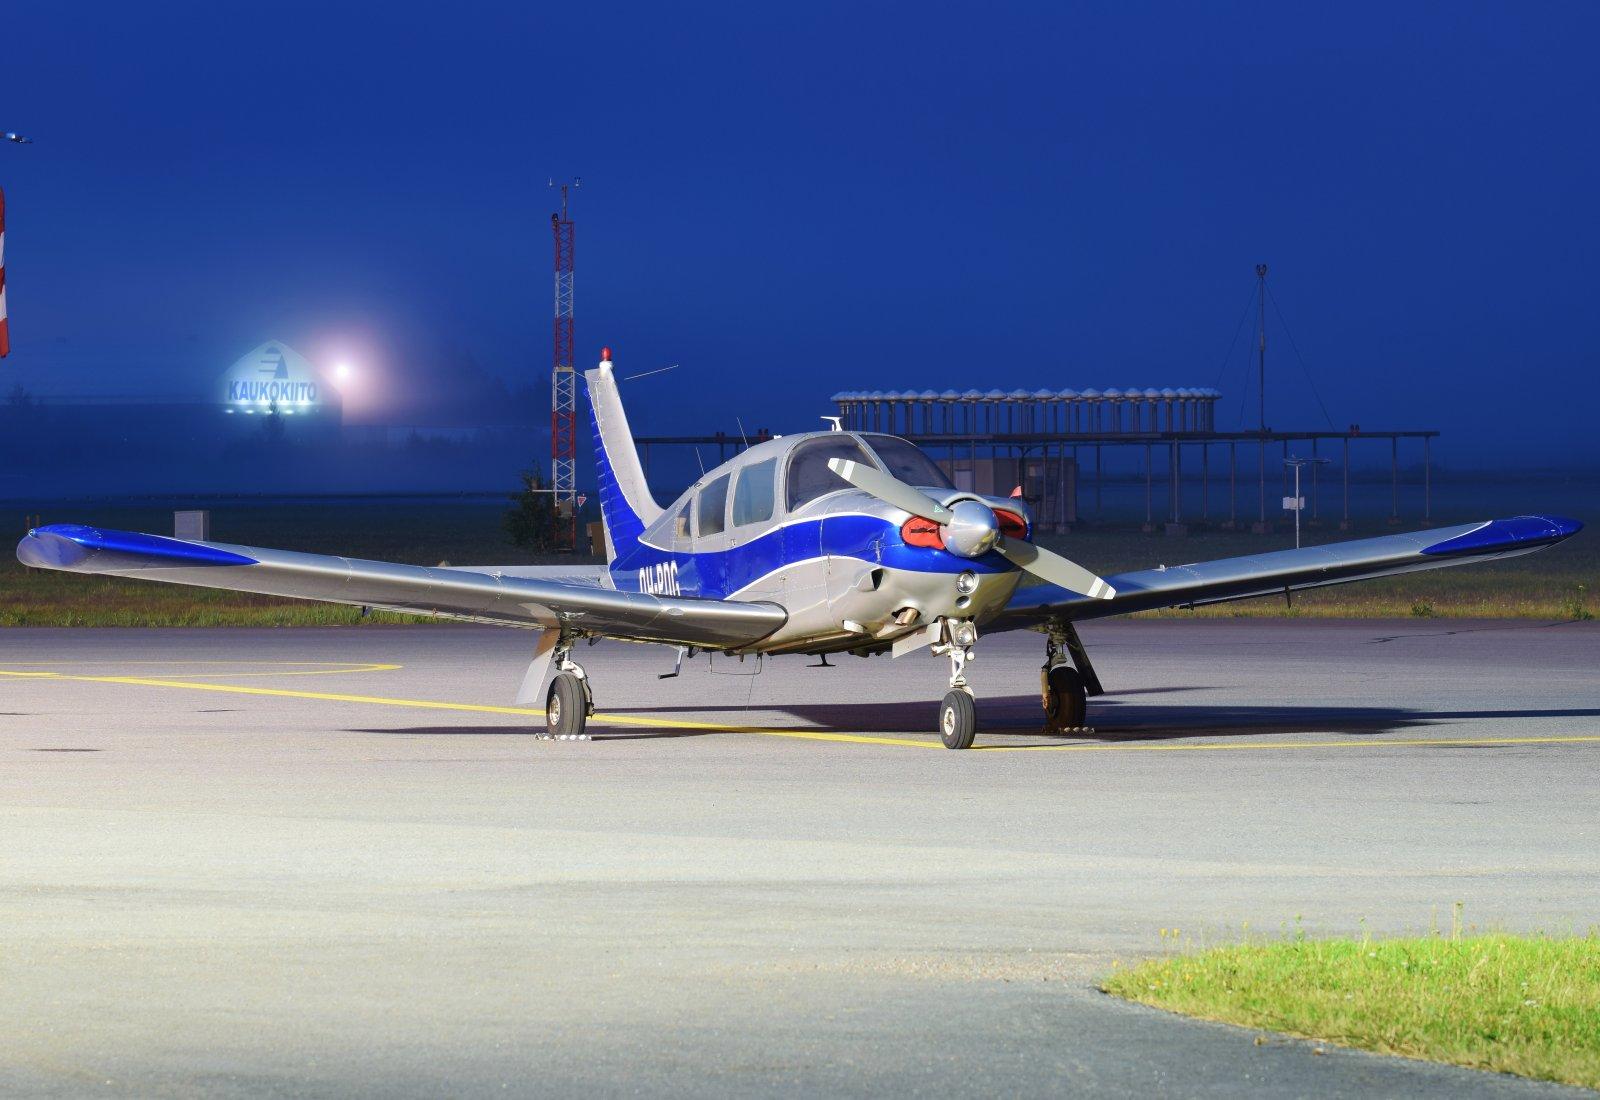 OH-PDG - Piper PA-28R-200 Arrow II - 24.7.2019